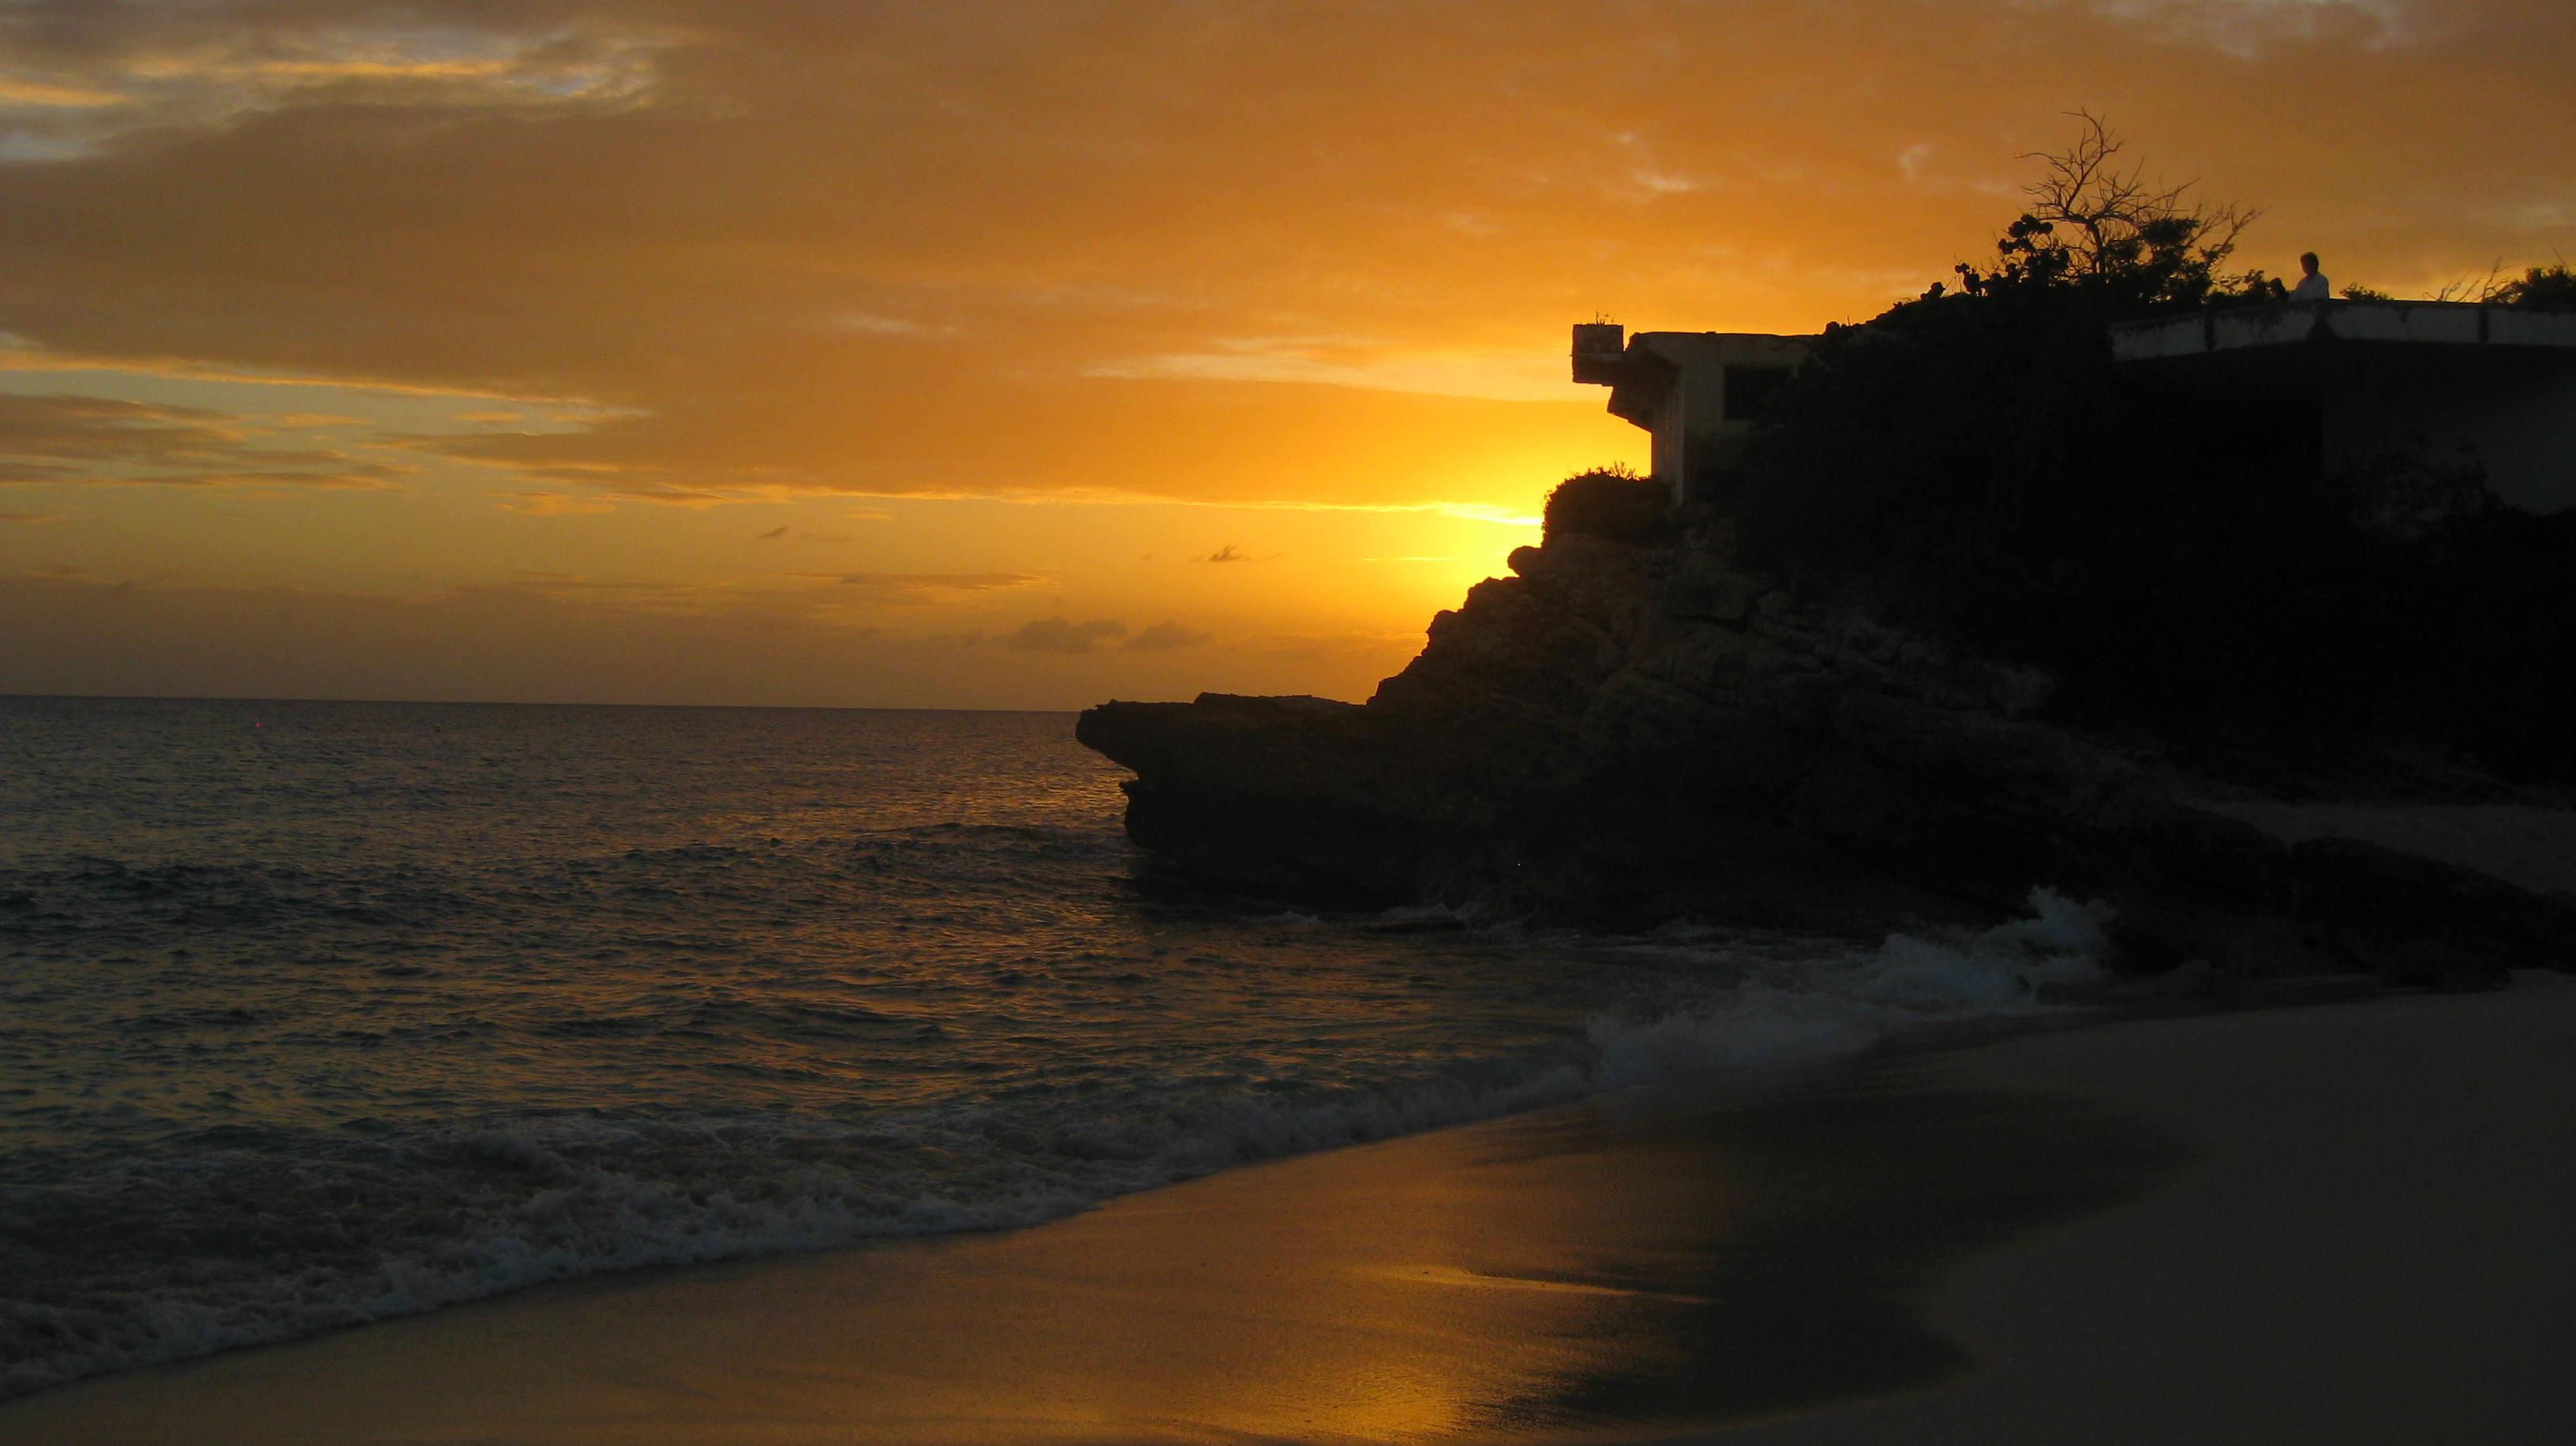 Mullet Bay at Sunset